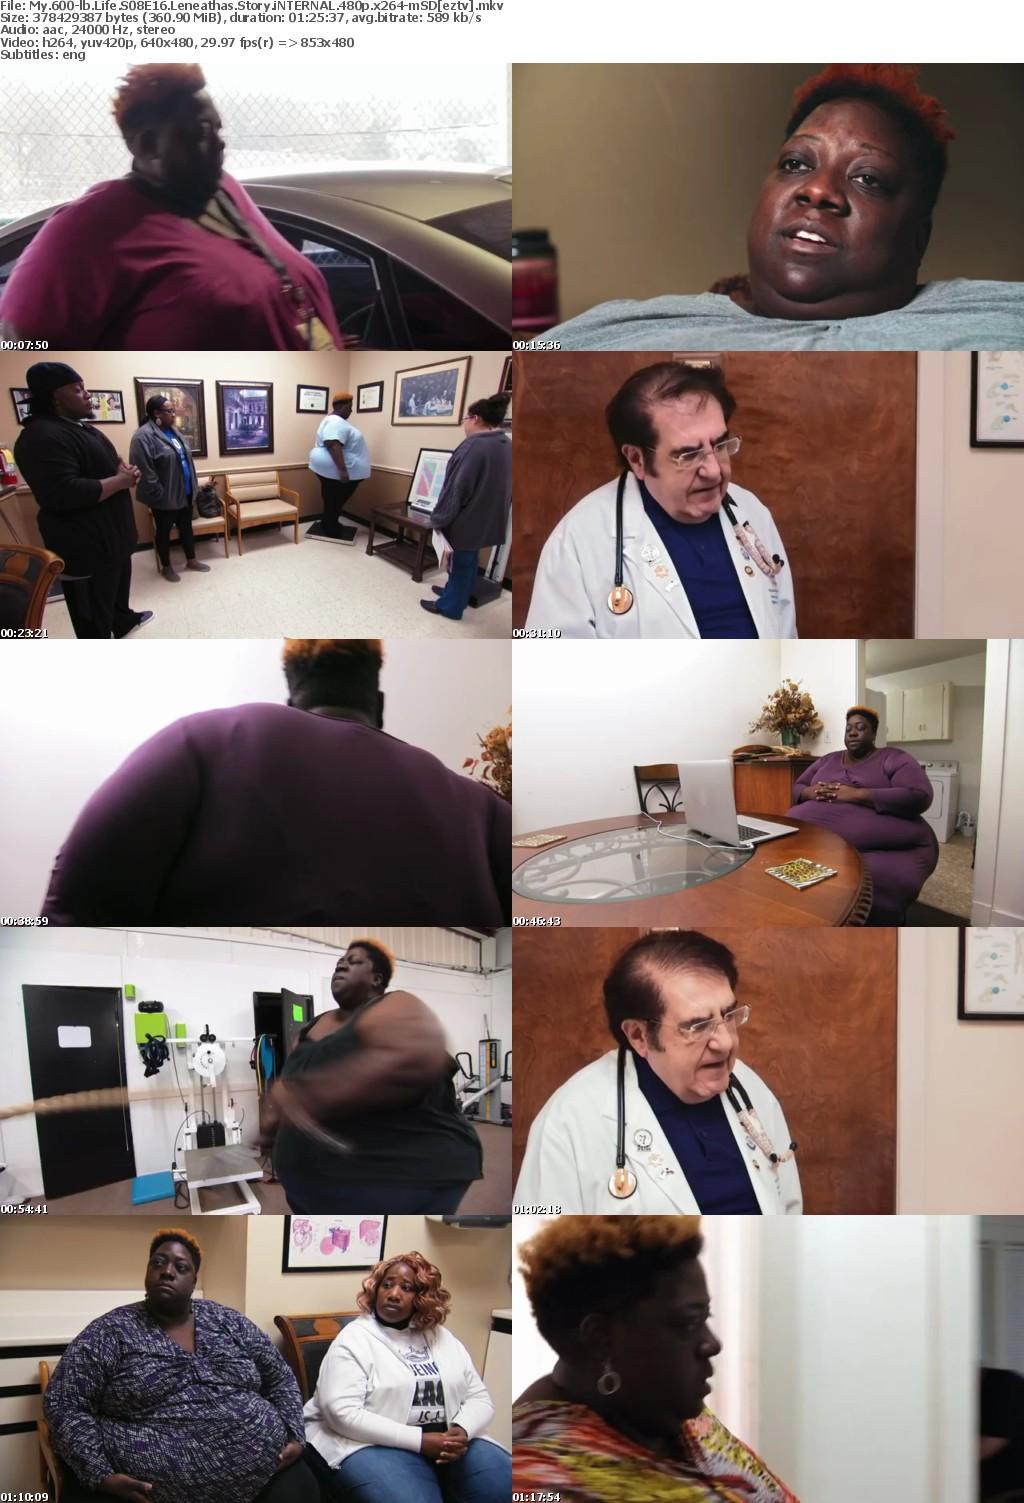 My 600-lb Life S08E16 Leneathas Story iNTERNAL 480p x264-mSD